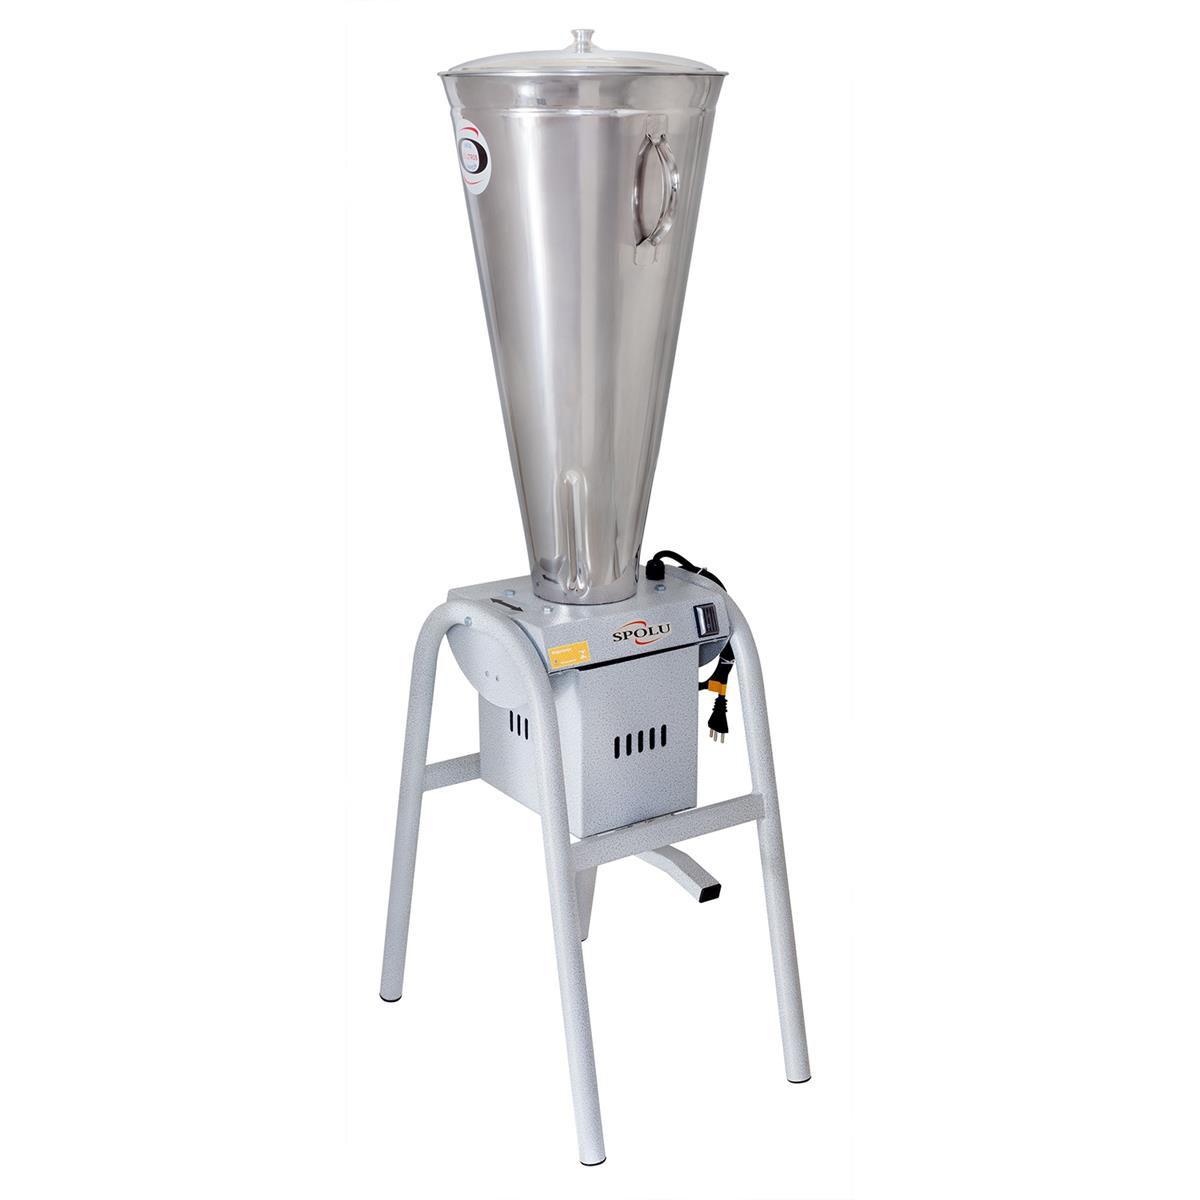 Liquidificador Industrial Spolu Basculante 25 Litros Inox 220V